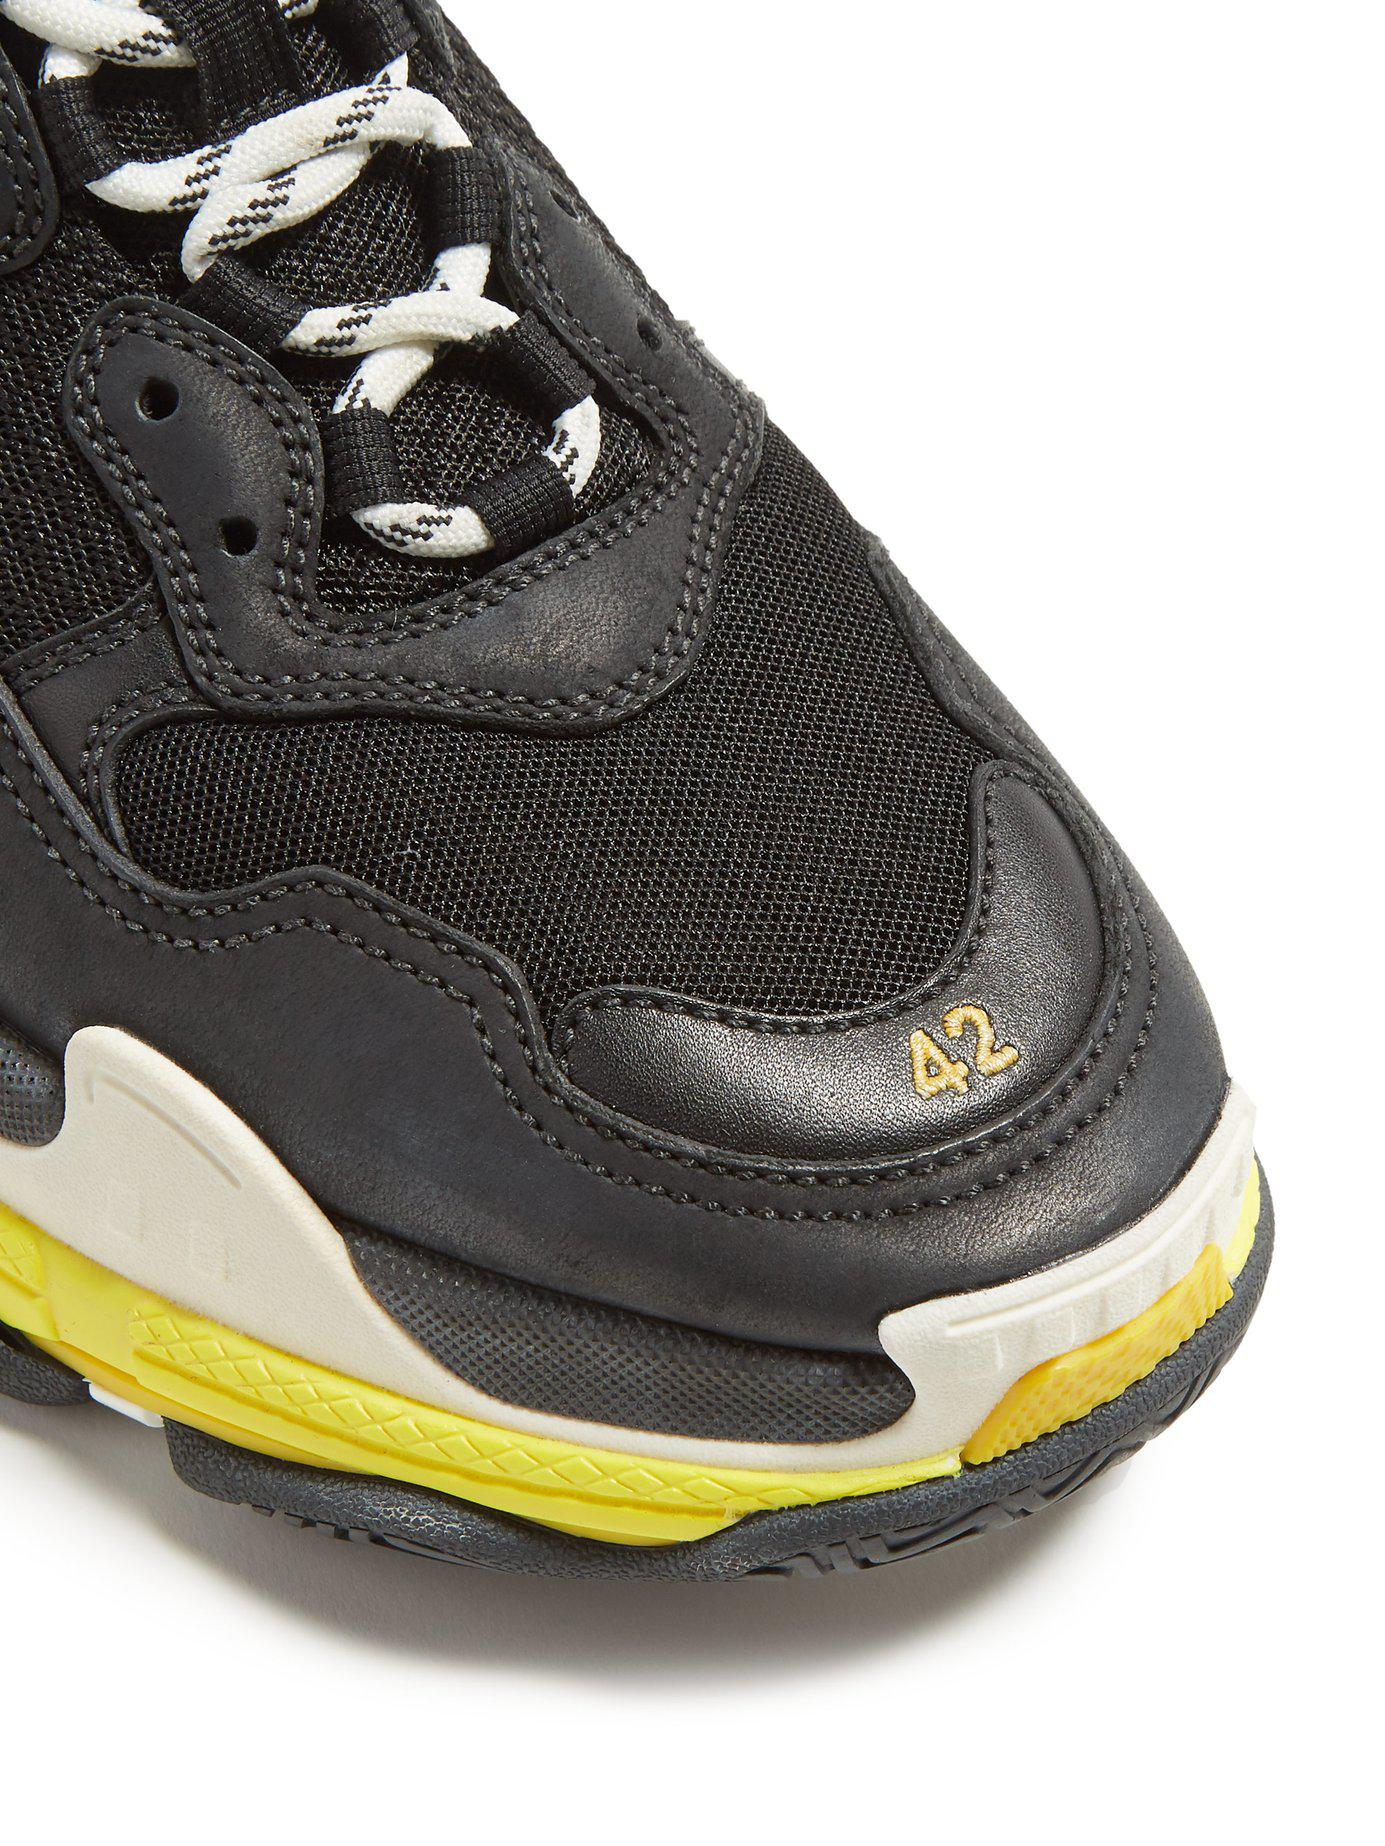 7a92530b24a9 Lyst - Balenciaga Triple S Platform Sneakers in Black for Men - Save 30%